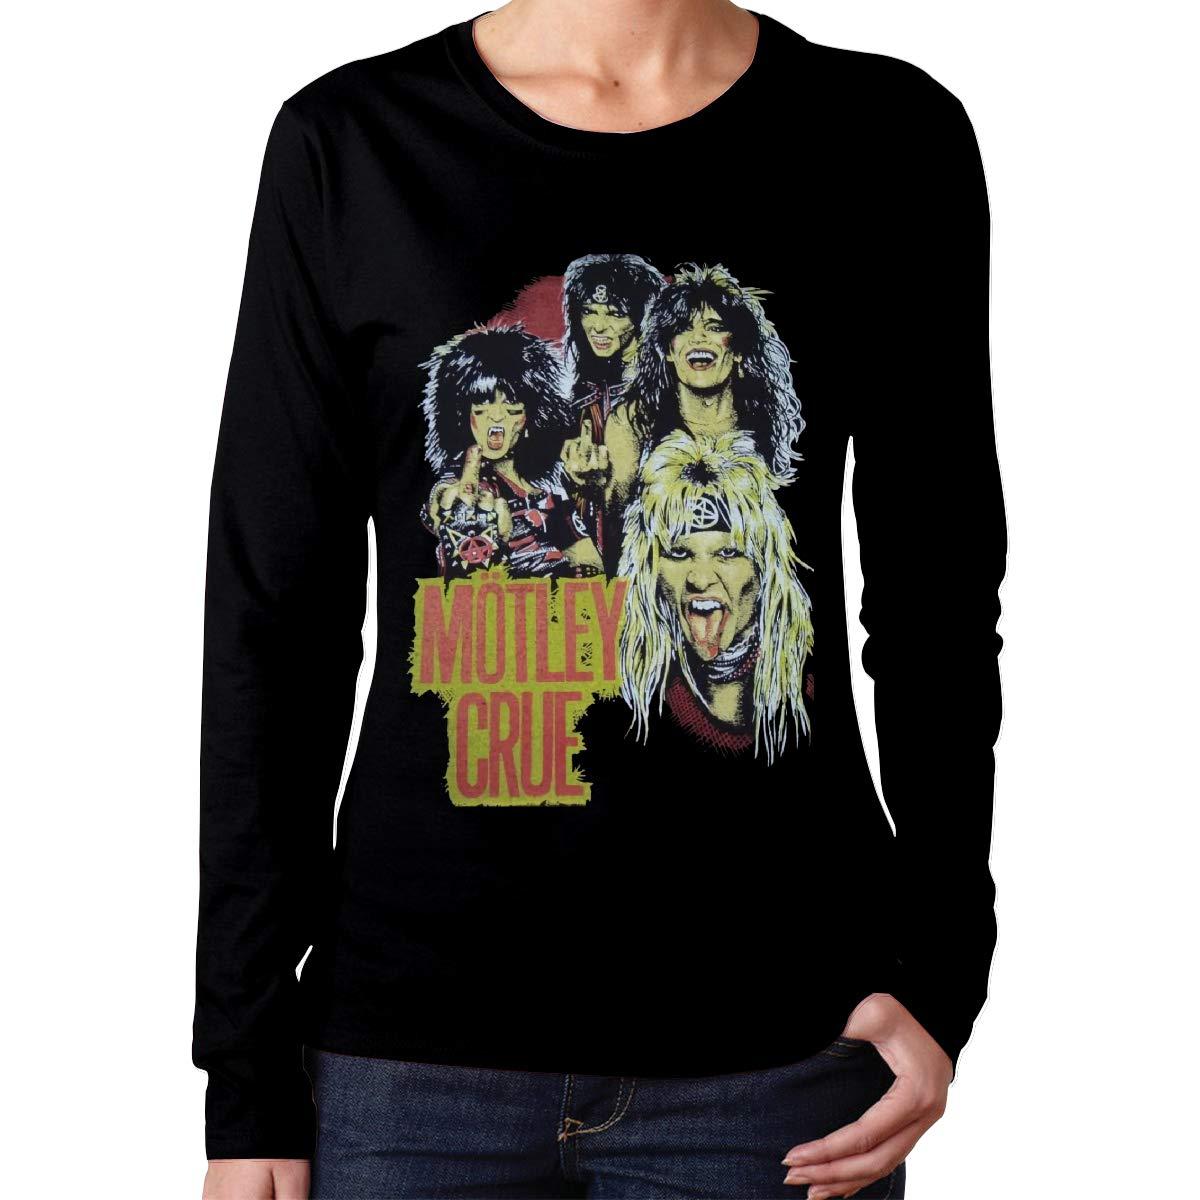 Mykjgilsdu Motley Crue Oneck Casual Tee Black Shirts